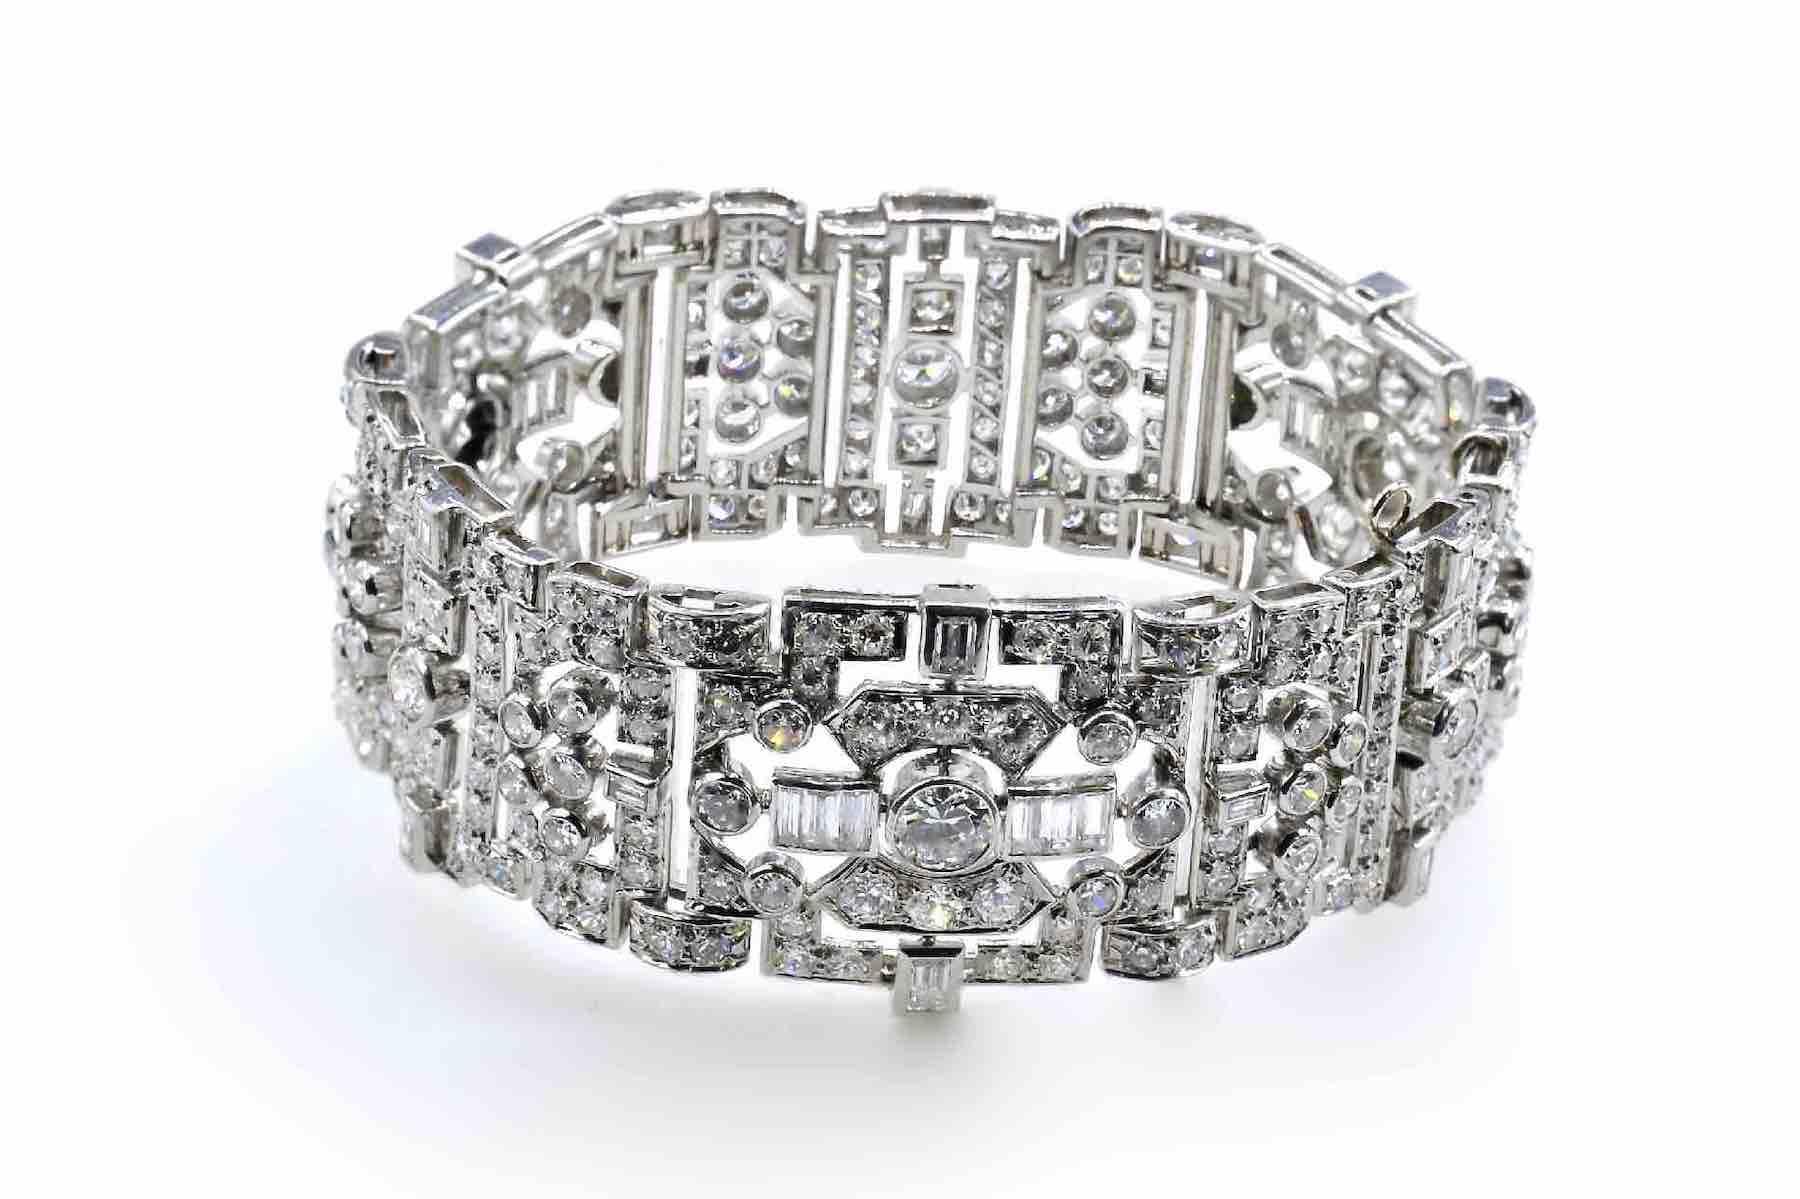 bracelet ancien or blanc 18k tout diamants